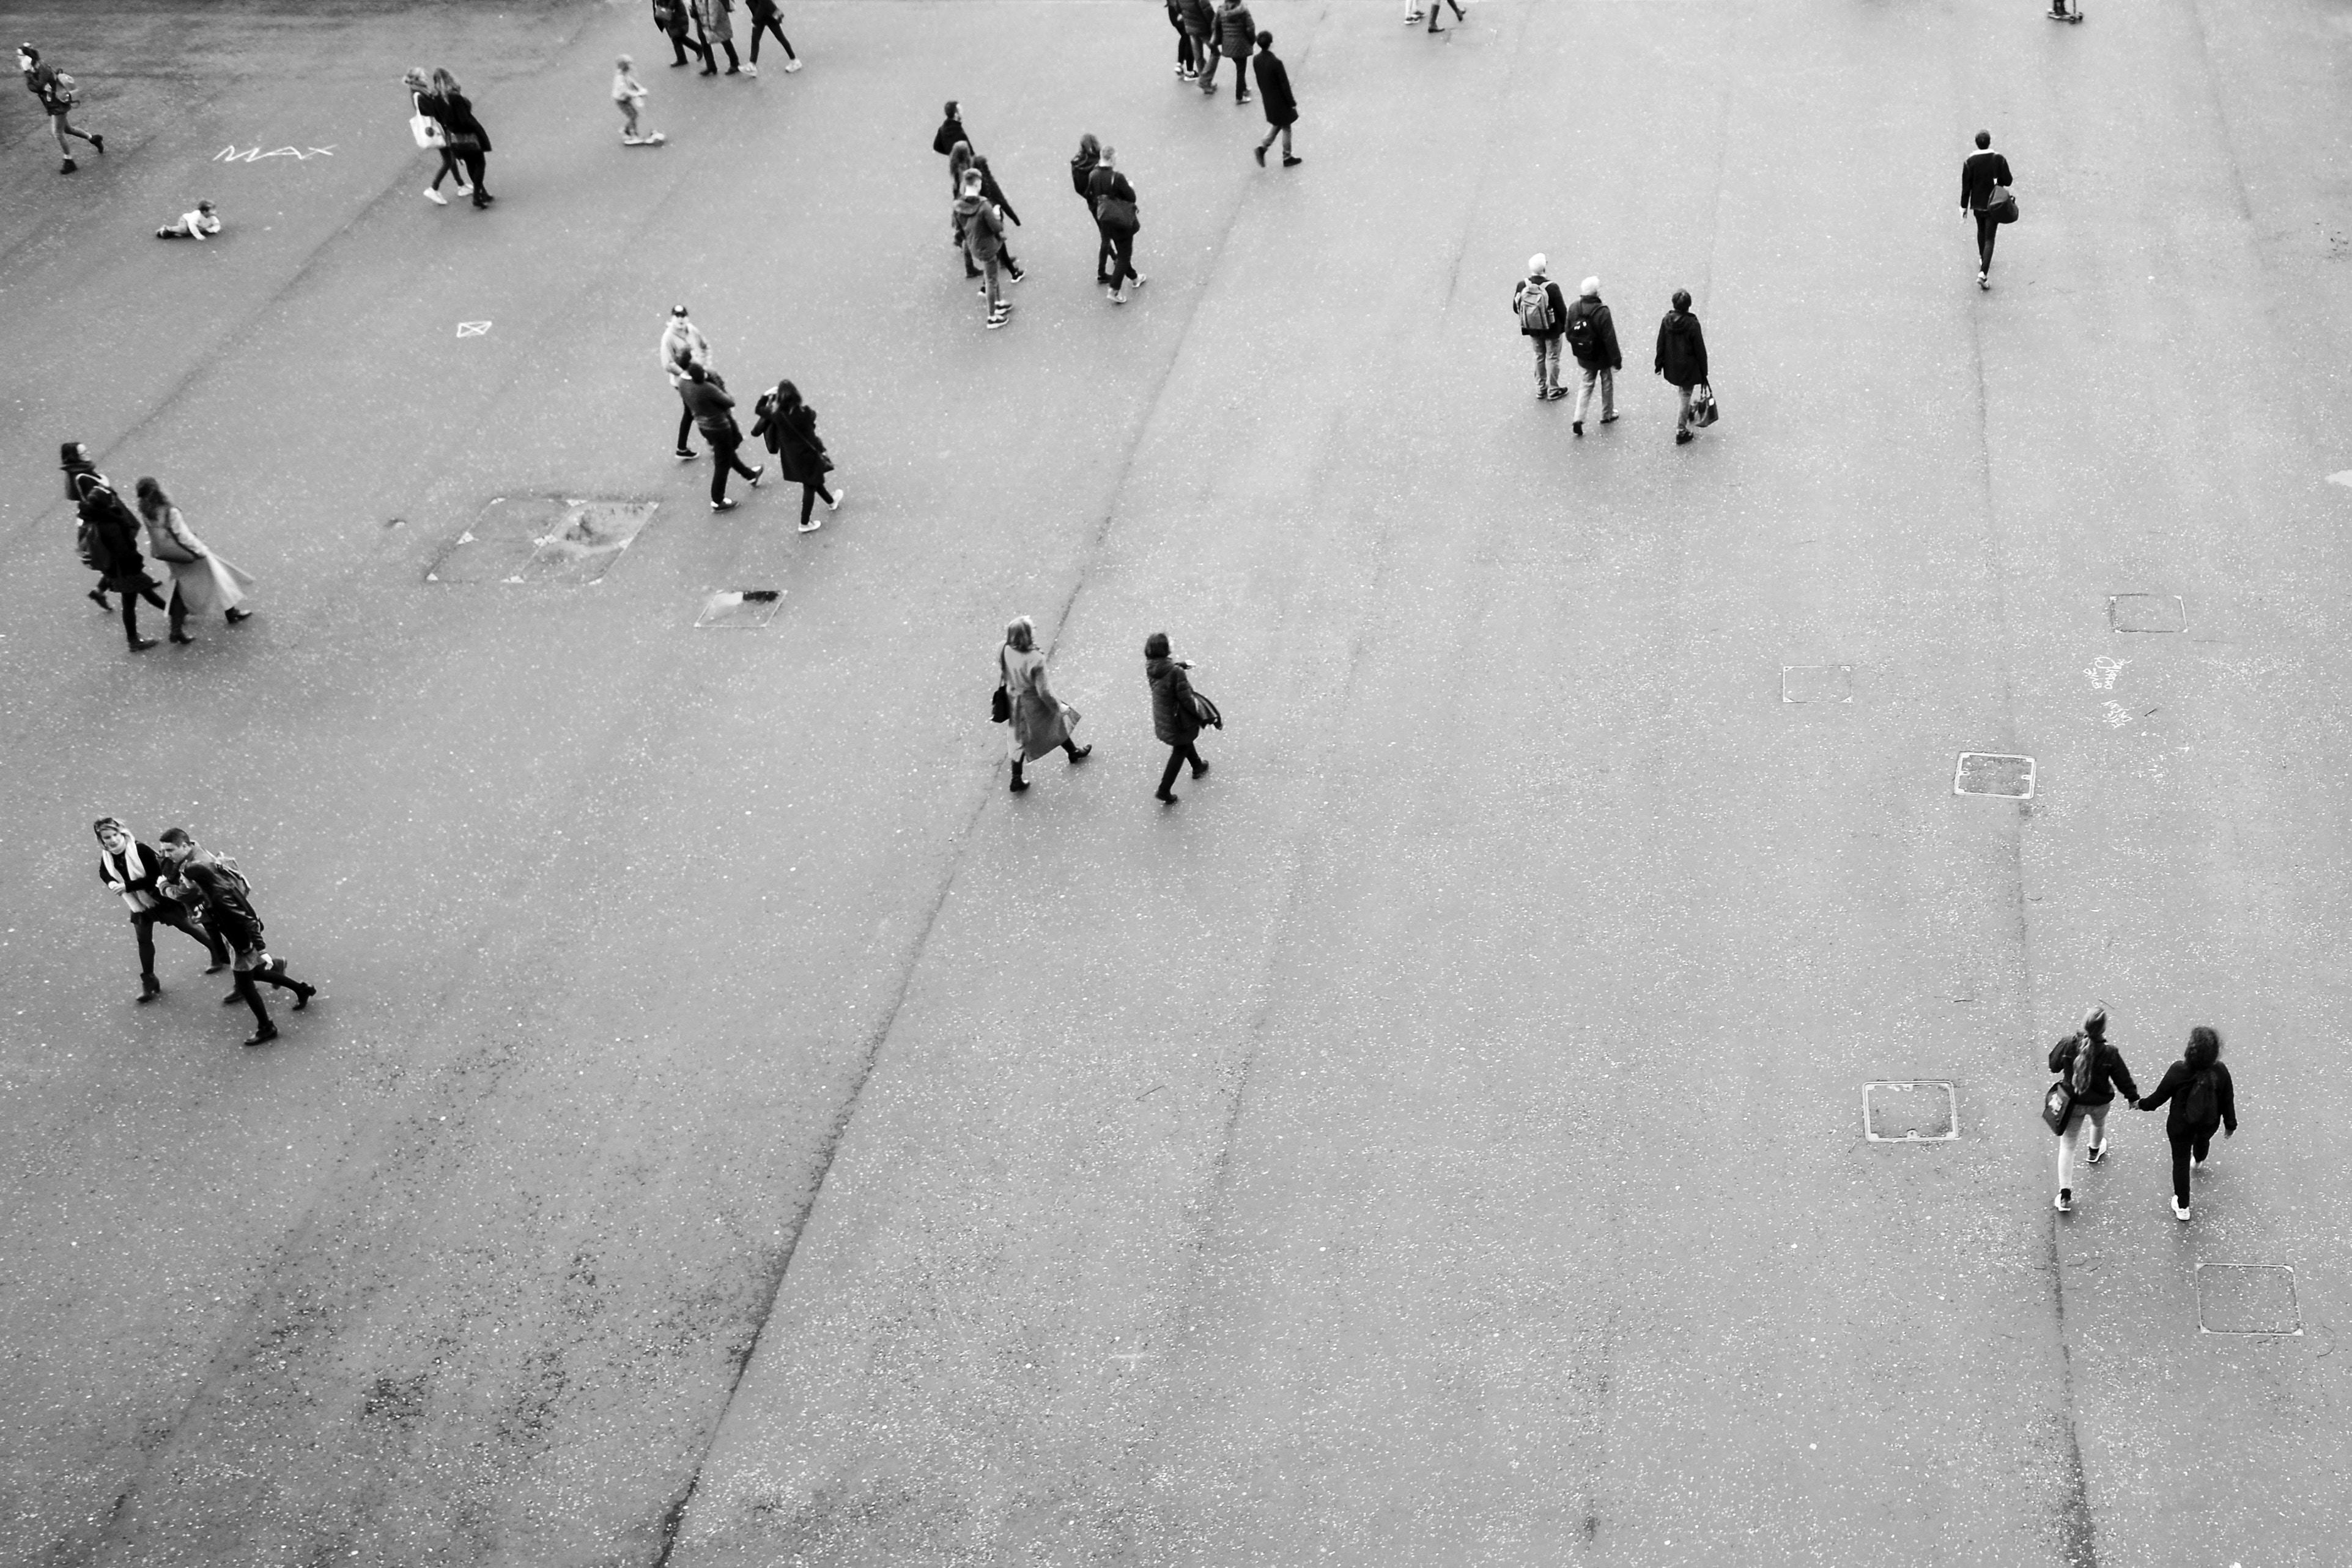 John Simitopoulos/Unsplash